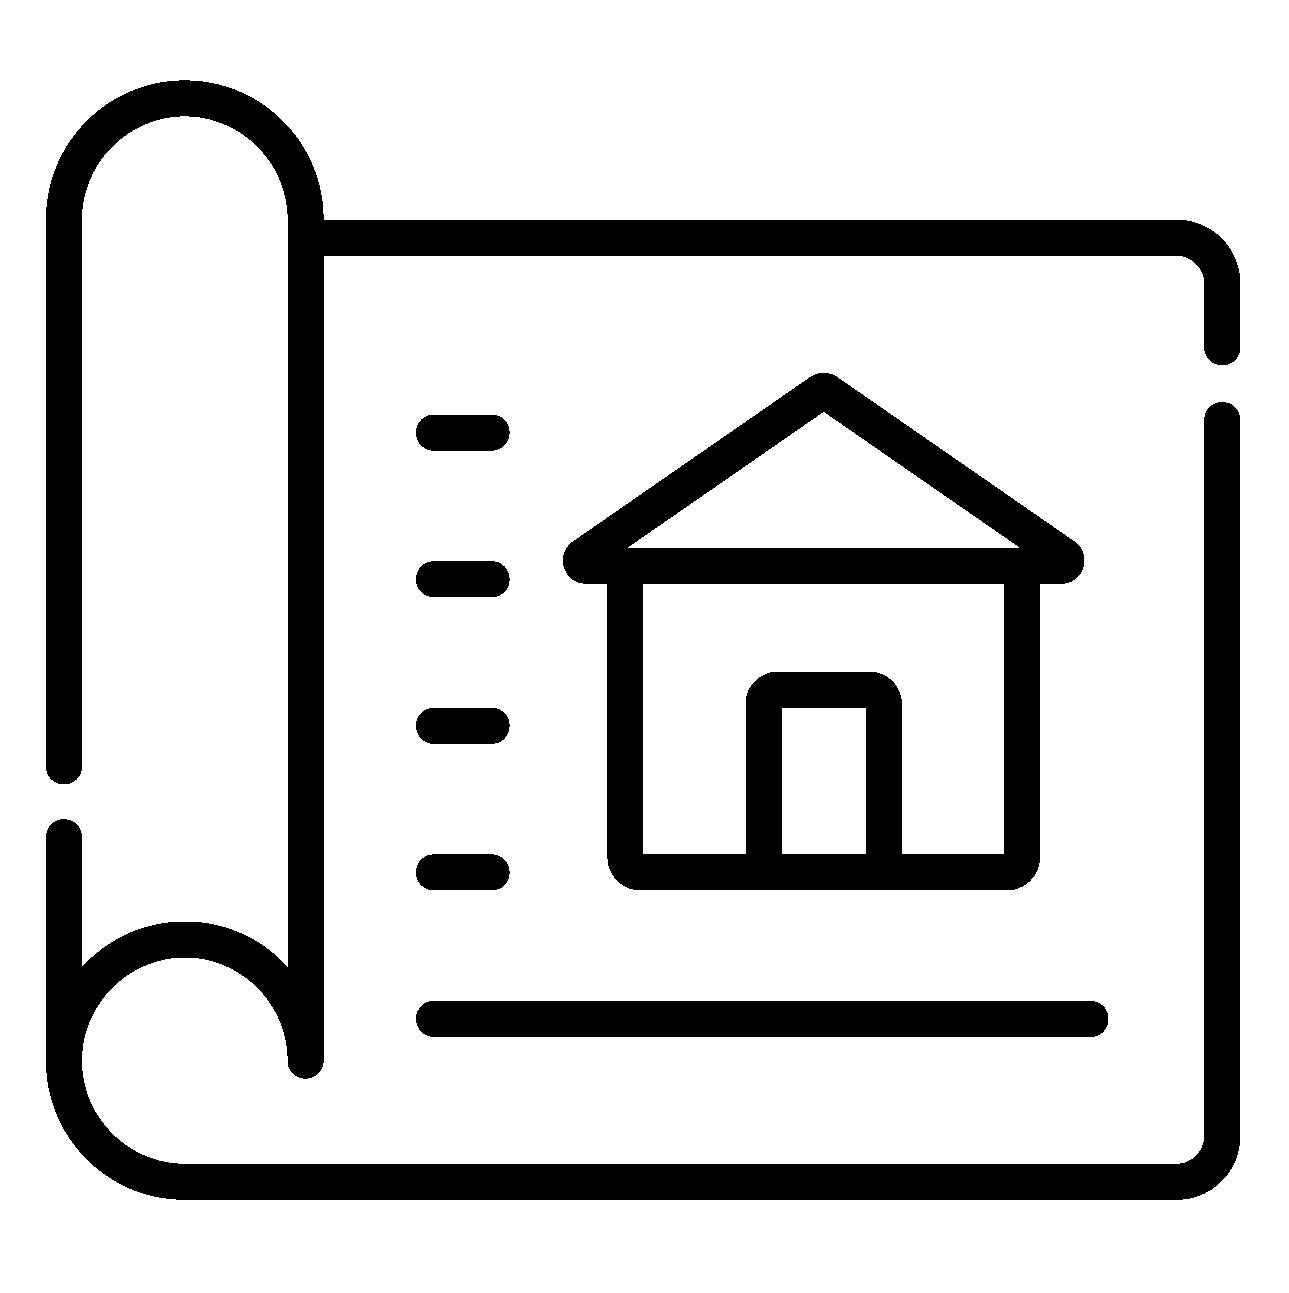 home-icon